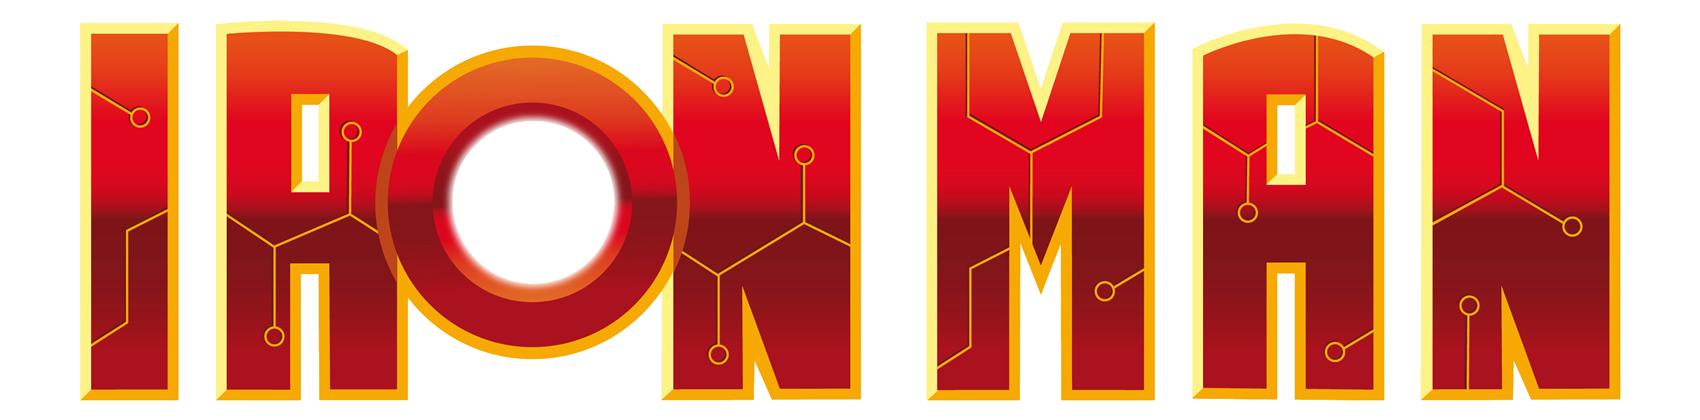 Iron Man (GGD) | Marvel Fanon | Fandom